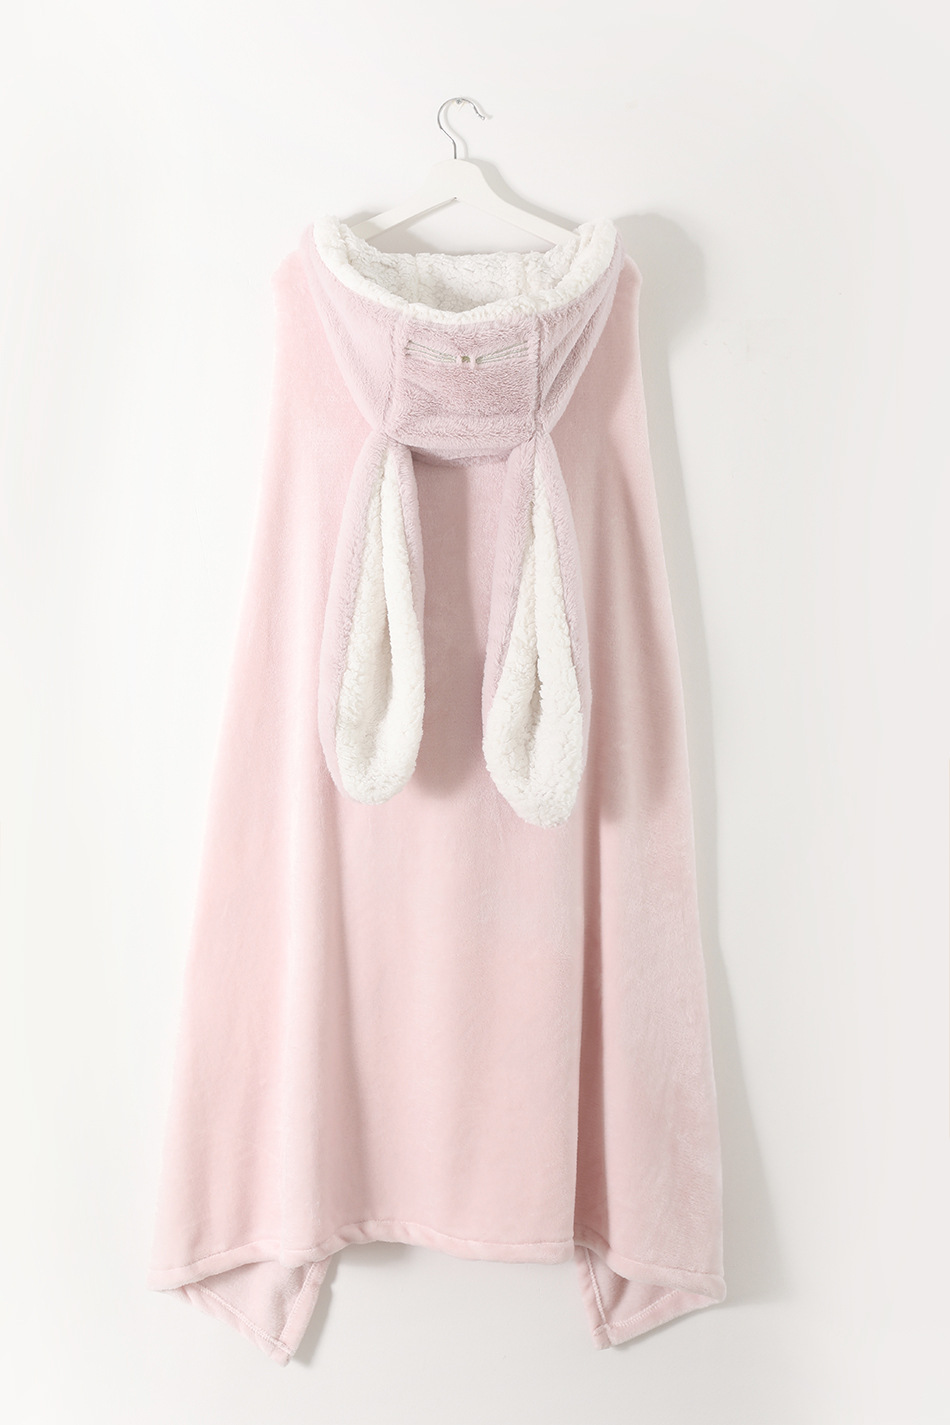 Cute Pink Comfy Blanket Sweatshirt Winter Warm Adults and Children Rabbit Ear Hooded Fleece Blanket Sleepwear Huge Bed Blankets 156